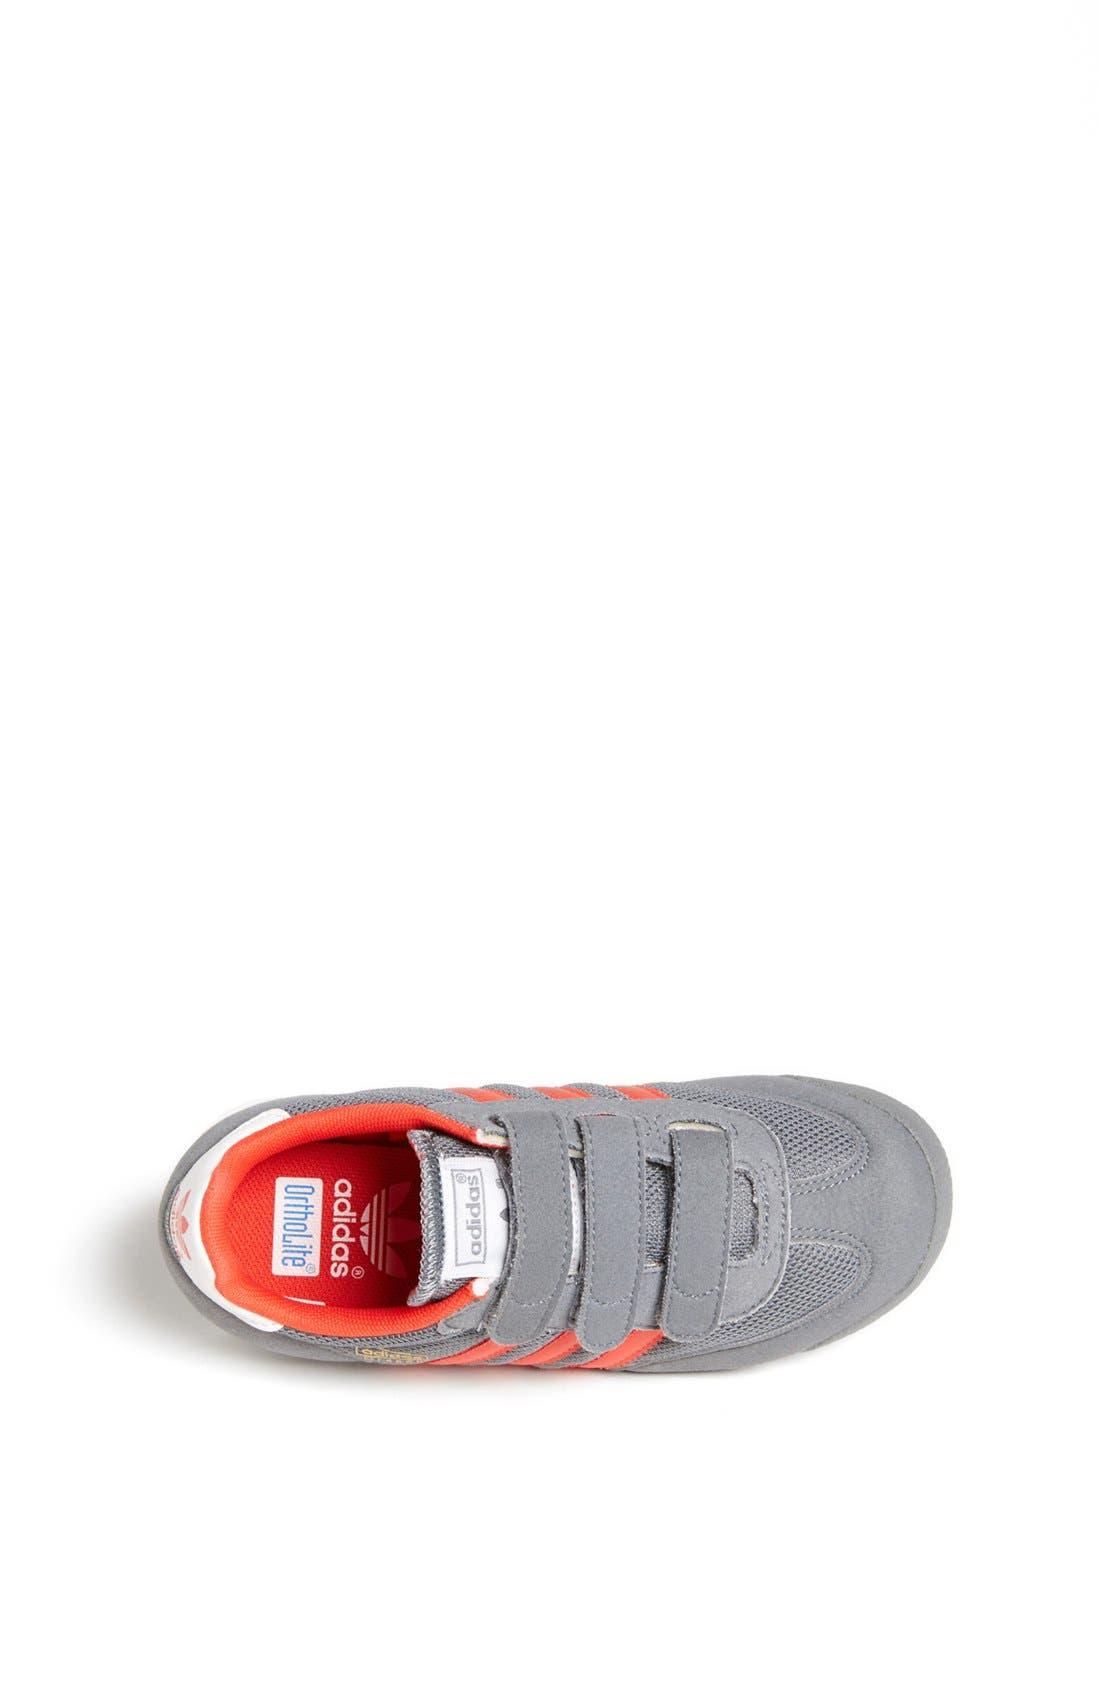 Alternate Image 3  - adidas 'Dragon' Sneaker (Toddler & Little Kid)